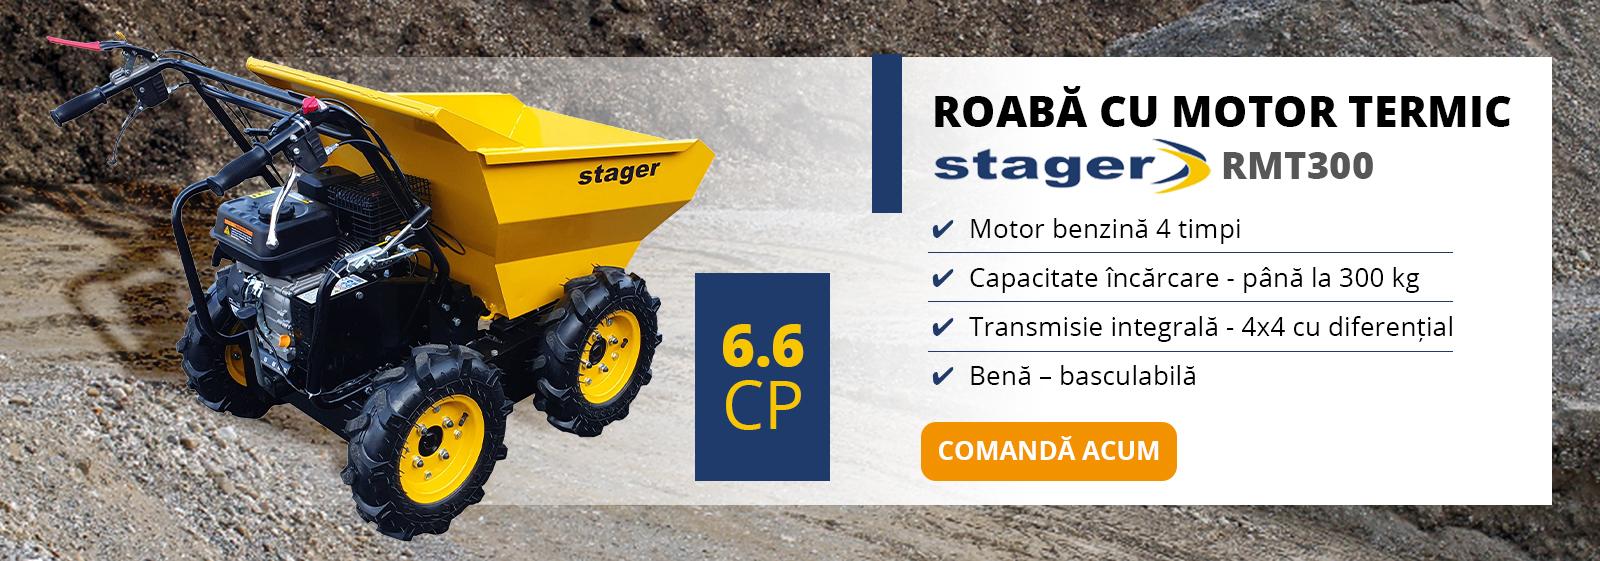 Promotie roaba Stager RMT300